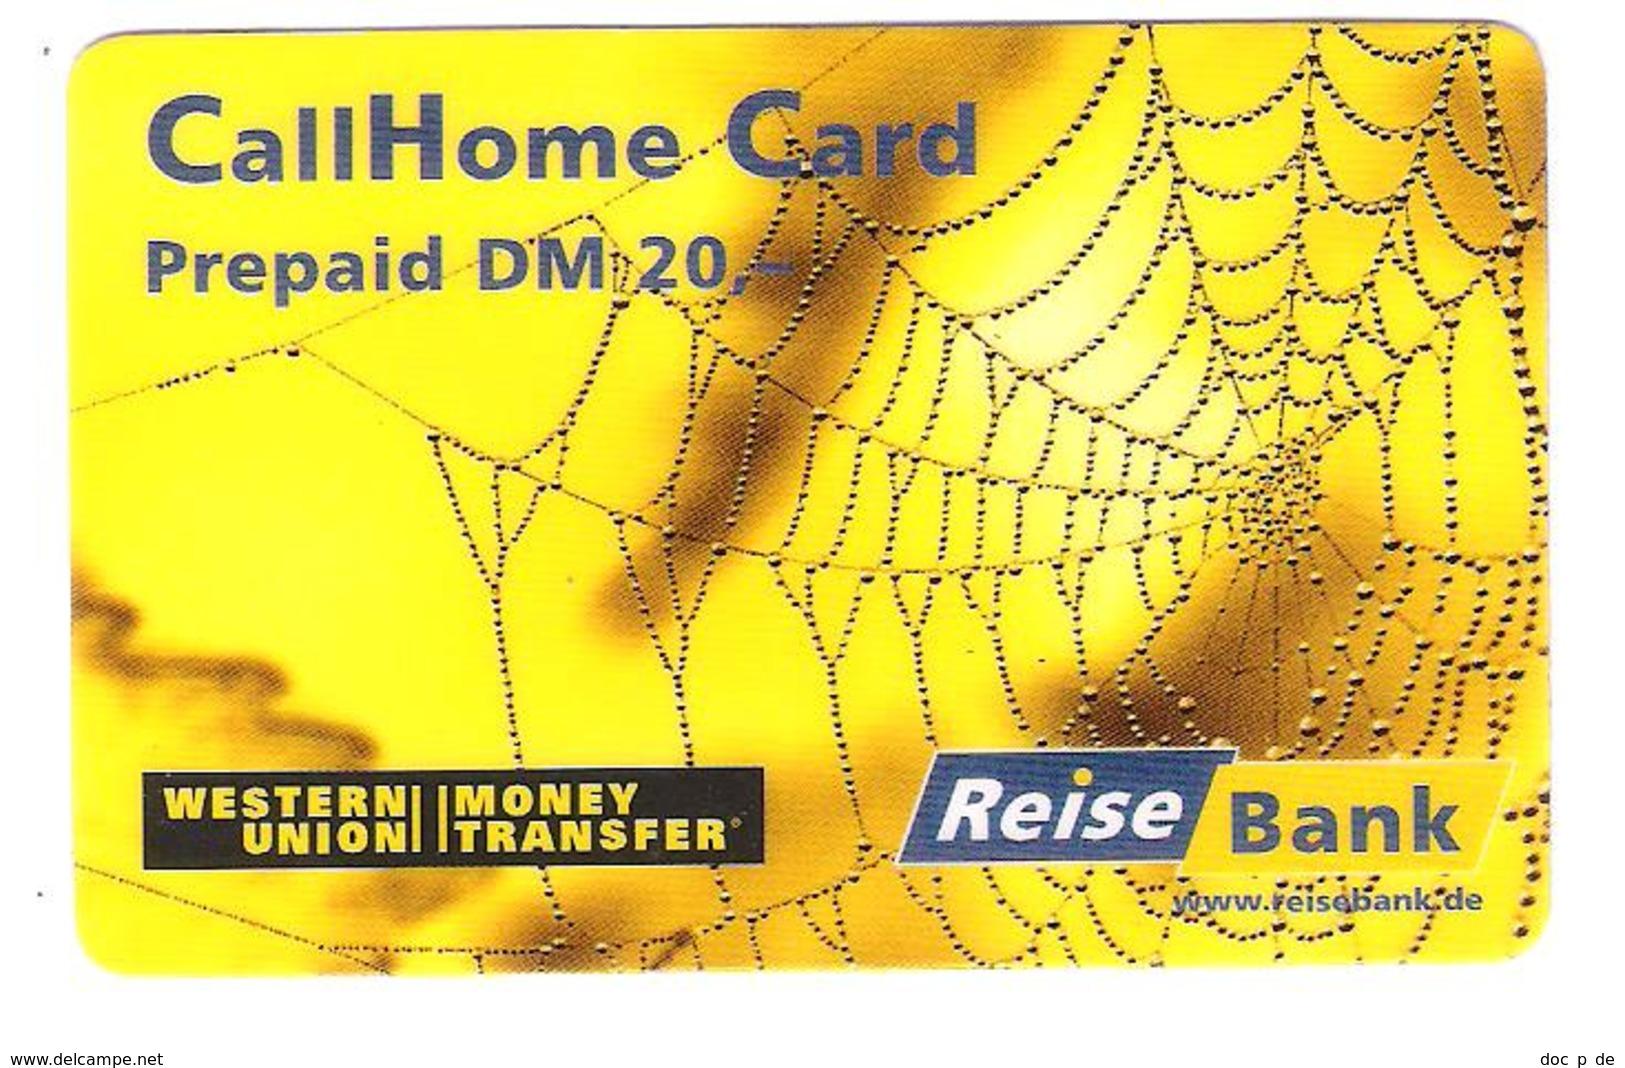 Germany - Prepaid Card - Call Home Card - Reisebank - Western Union - 20 DM - Spider - Germany